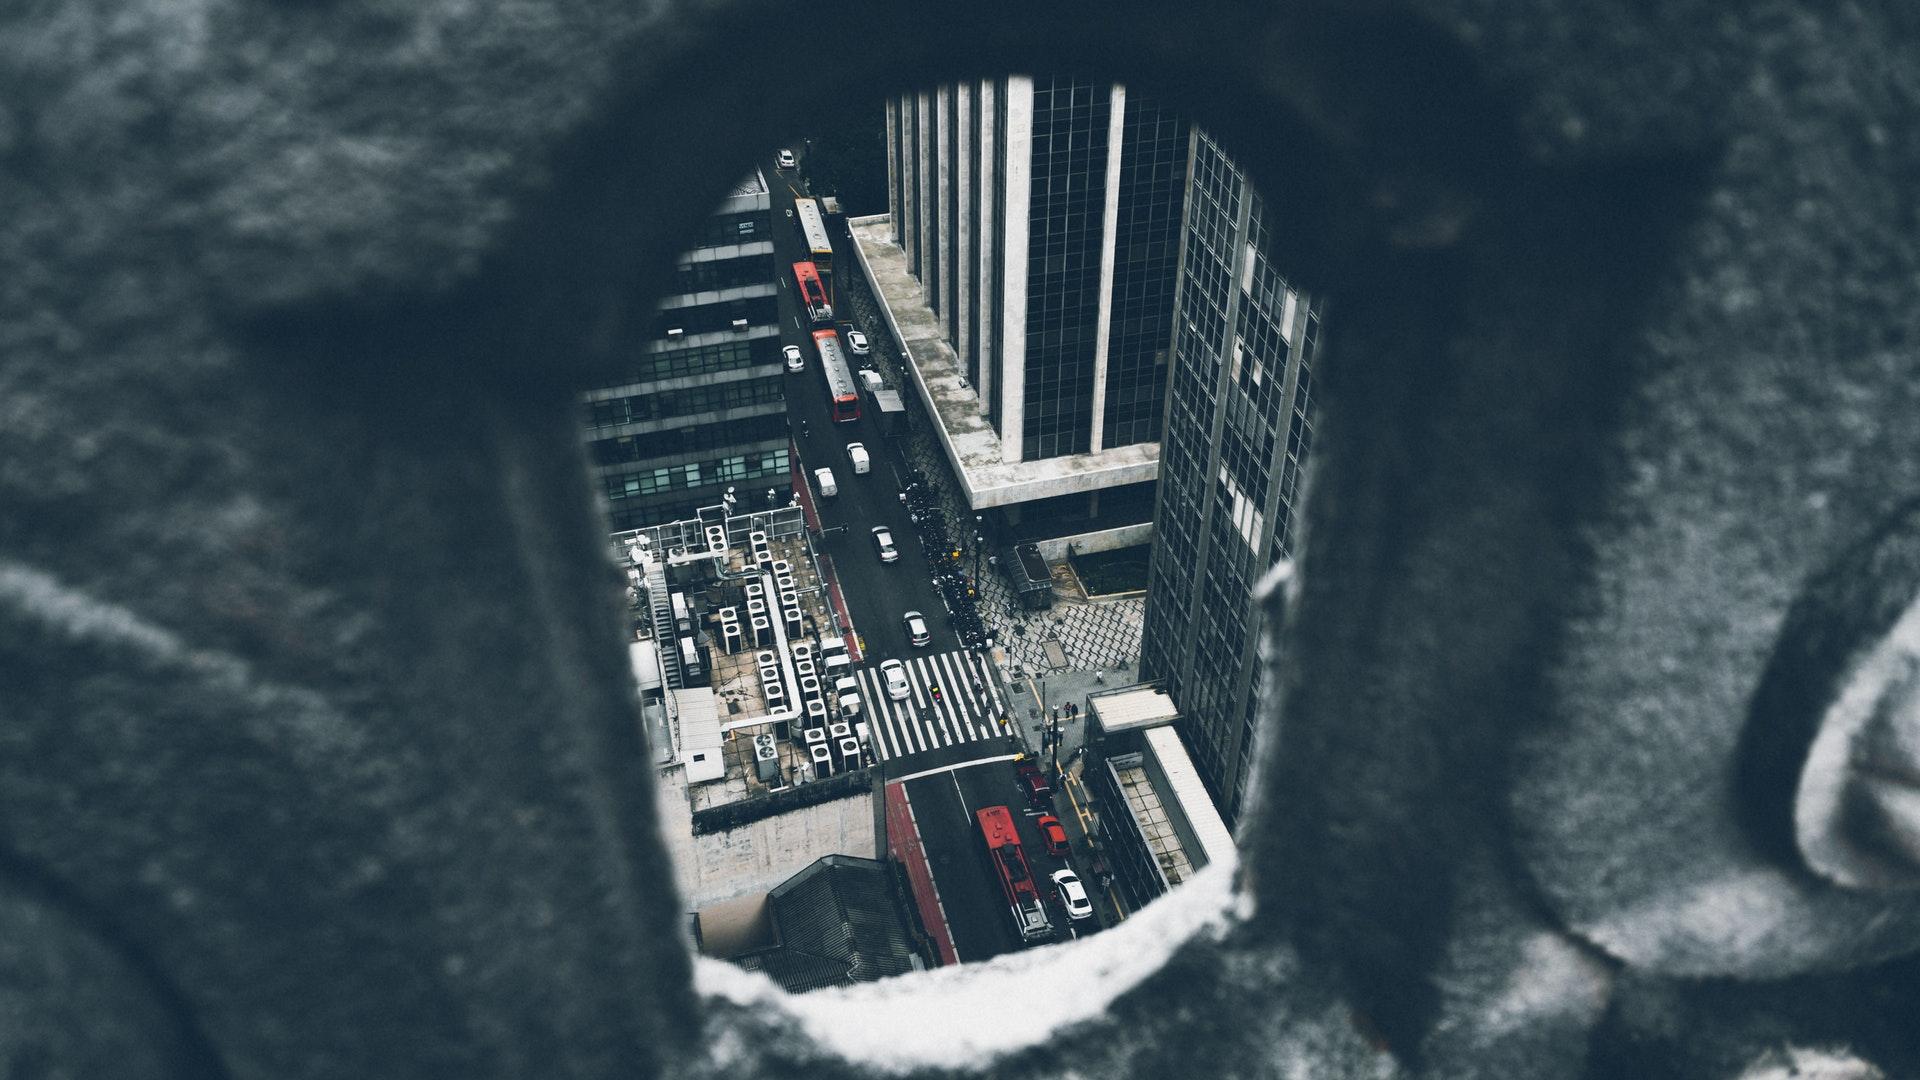 pexels-photo-243756.jpeg